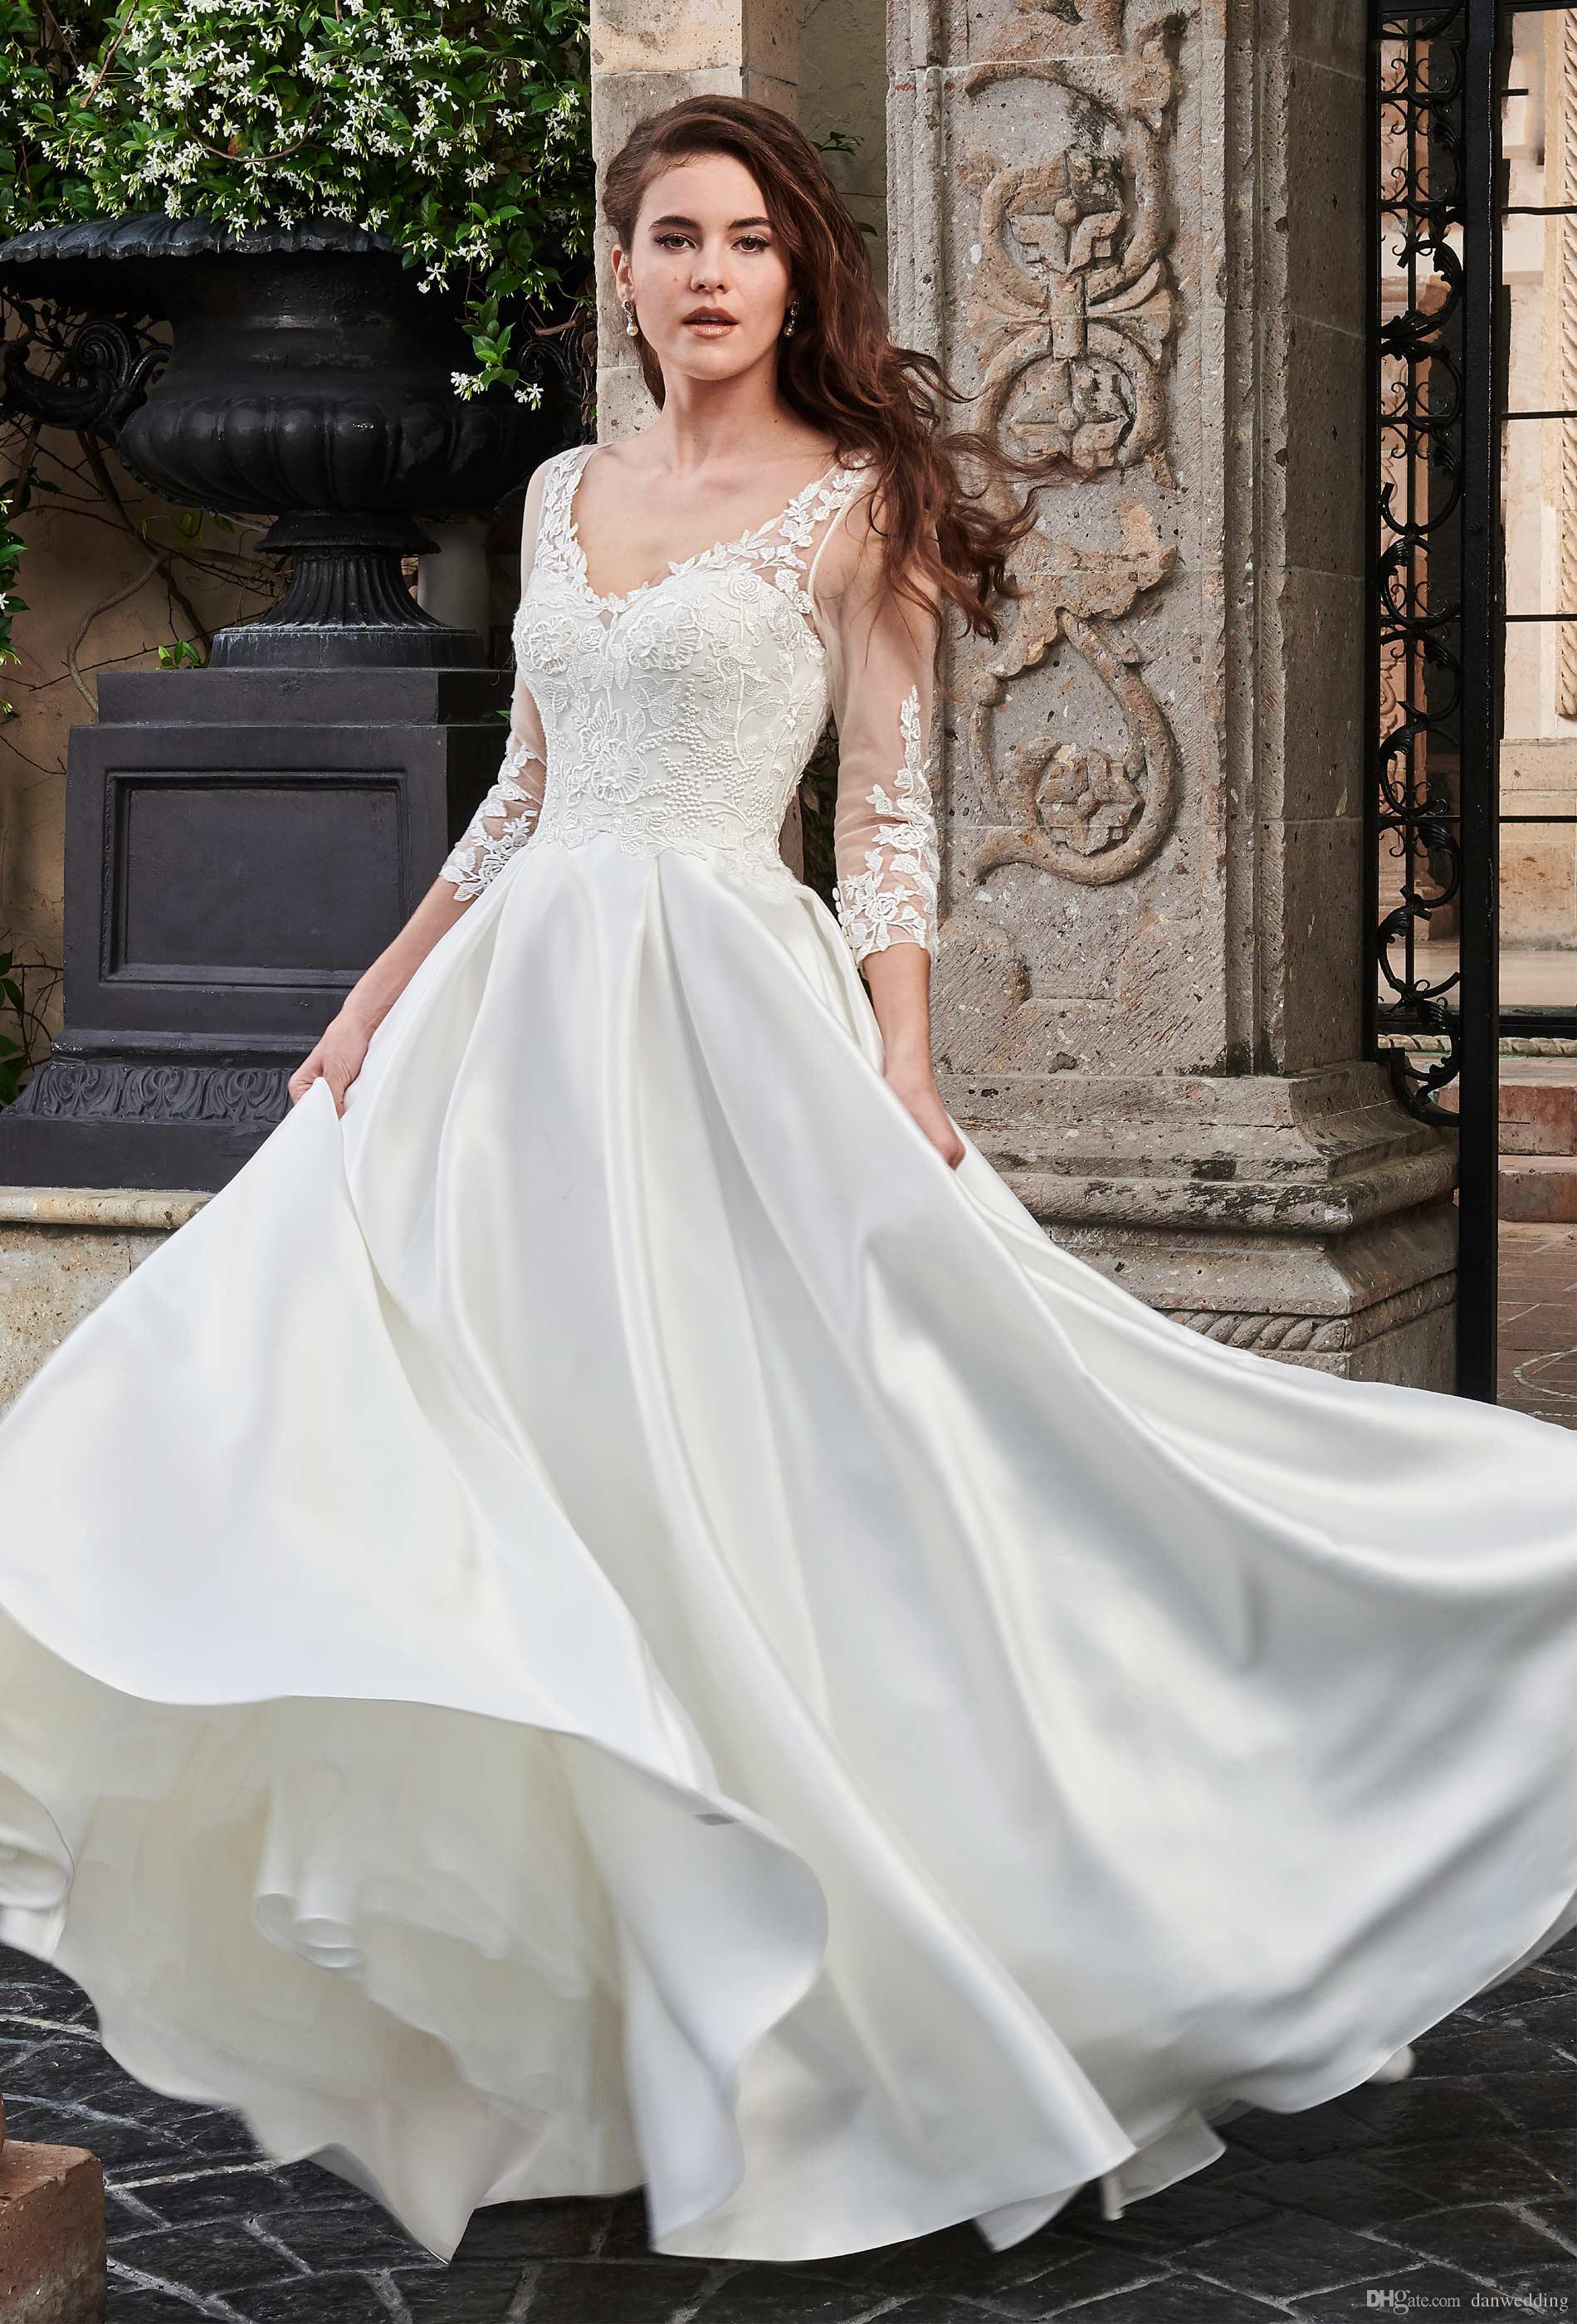 Beauty Ivory V-Neck Applique 3/4 Sleeves A-Line Wedding Dresses Bridal Pageant Dresses Wedding Attire Dresses Custom Size 2-16 KF1125162